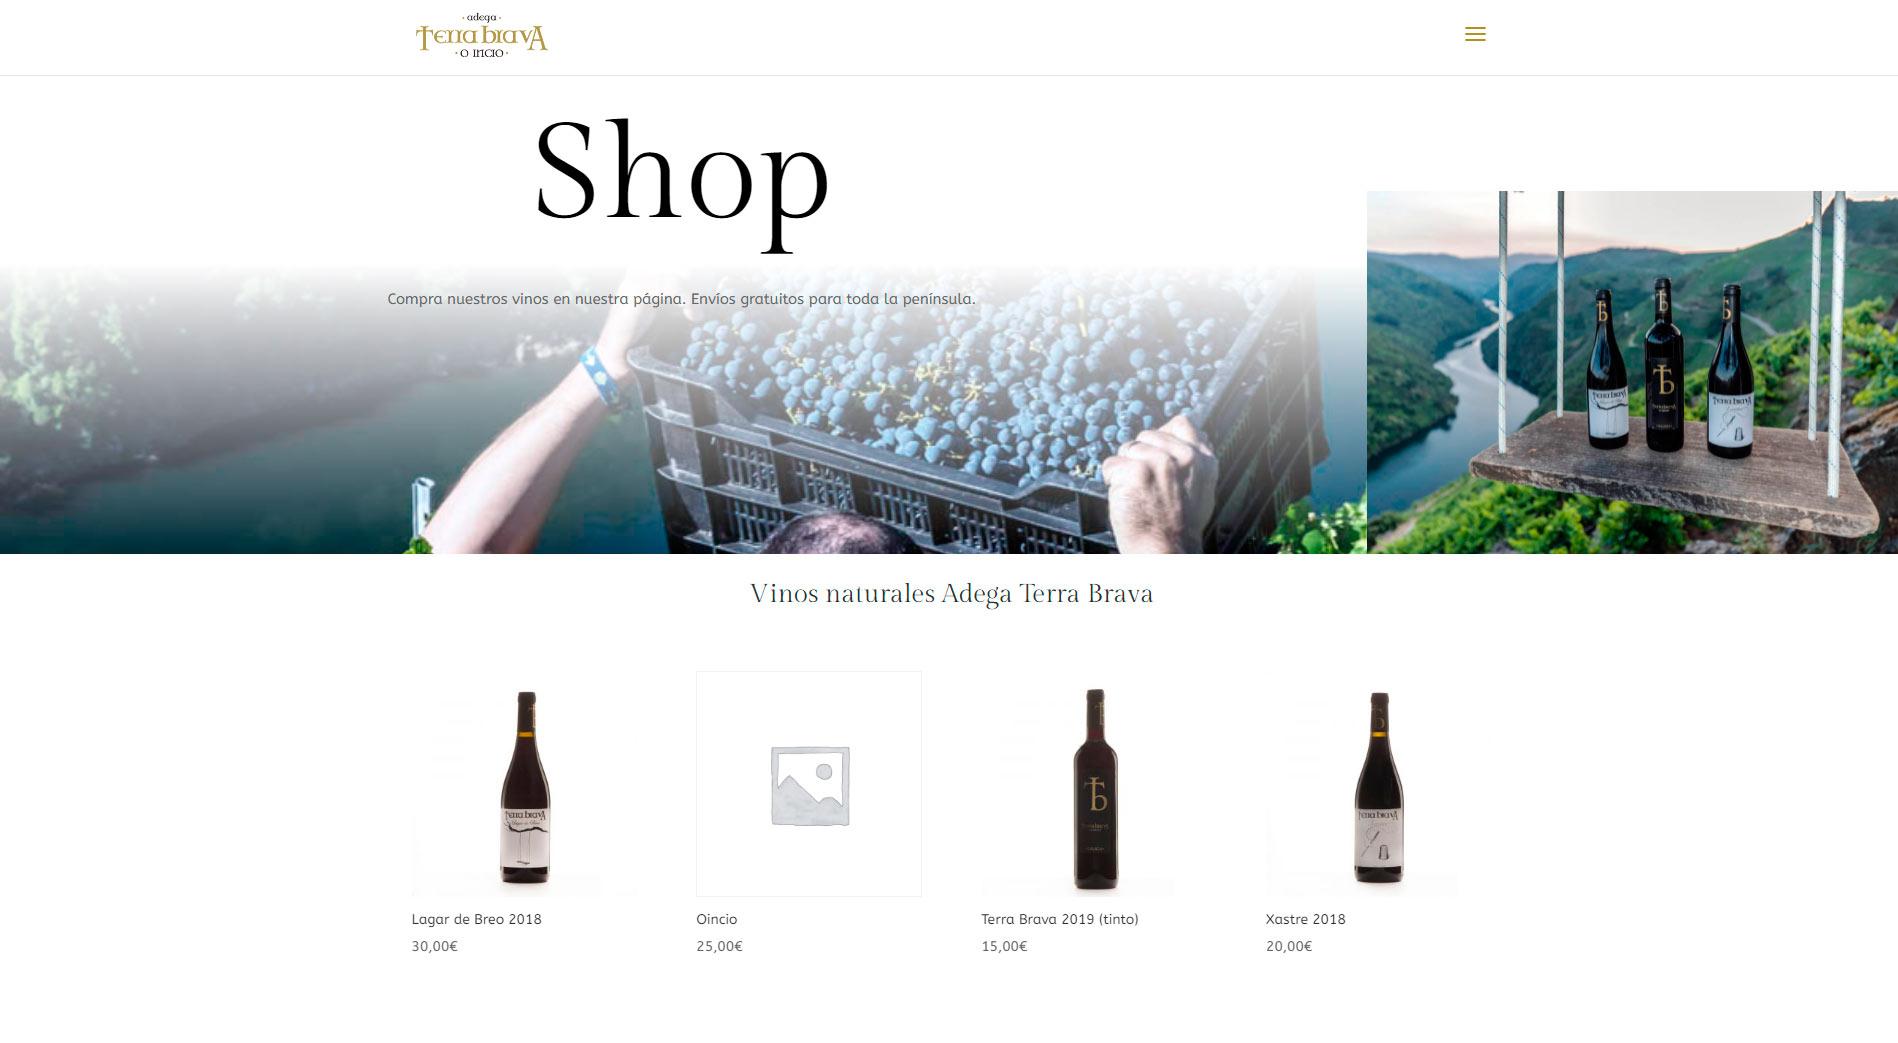 shop Adega Terra Brava